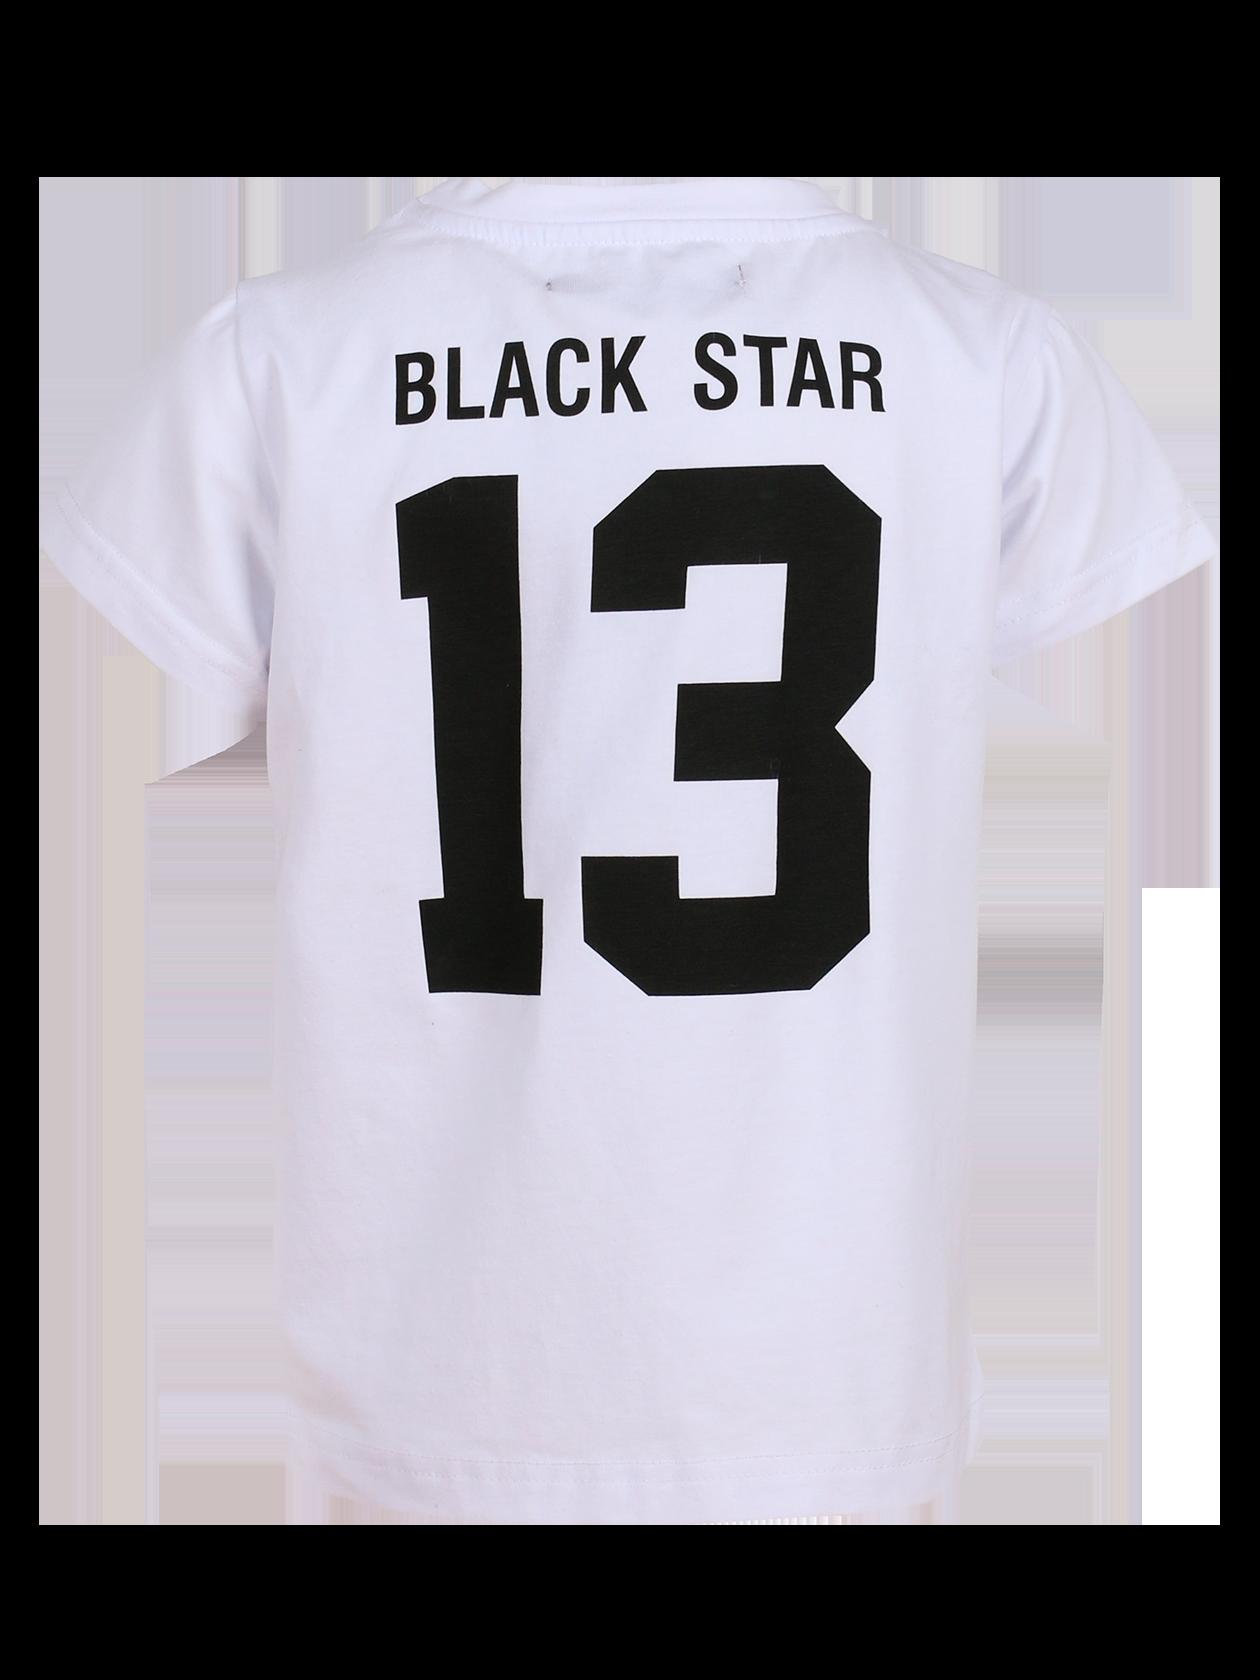 Футболка подростковая BLACK STAR 13 от Black Star